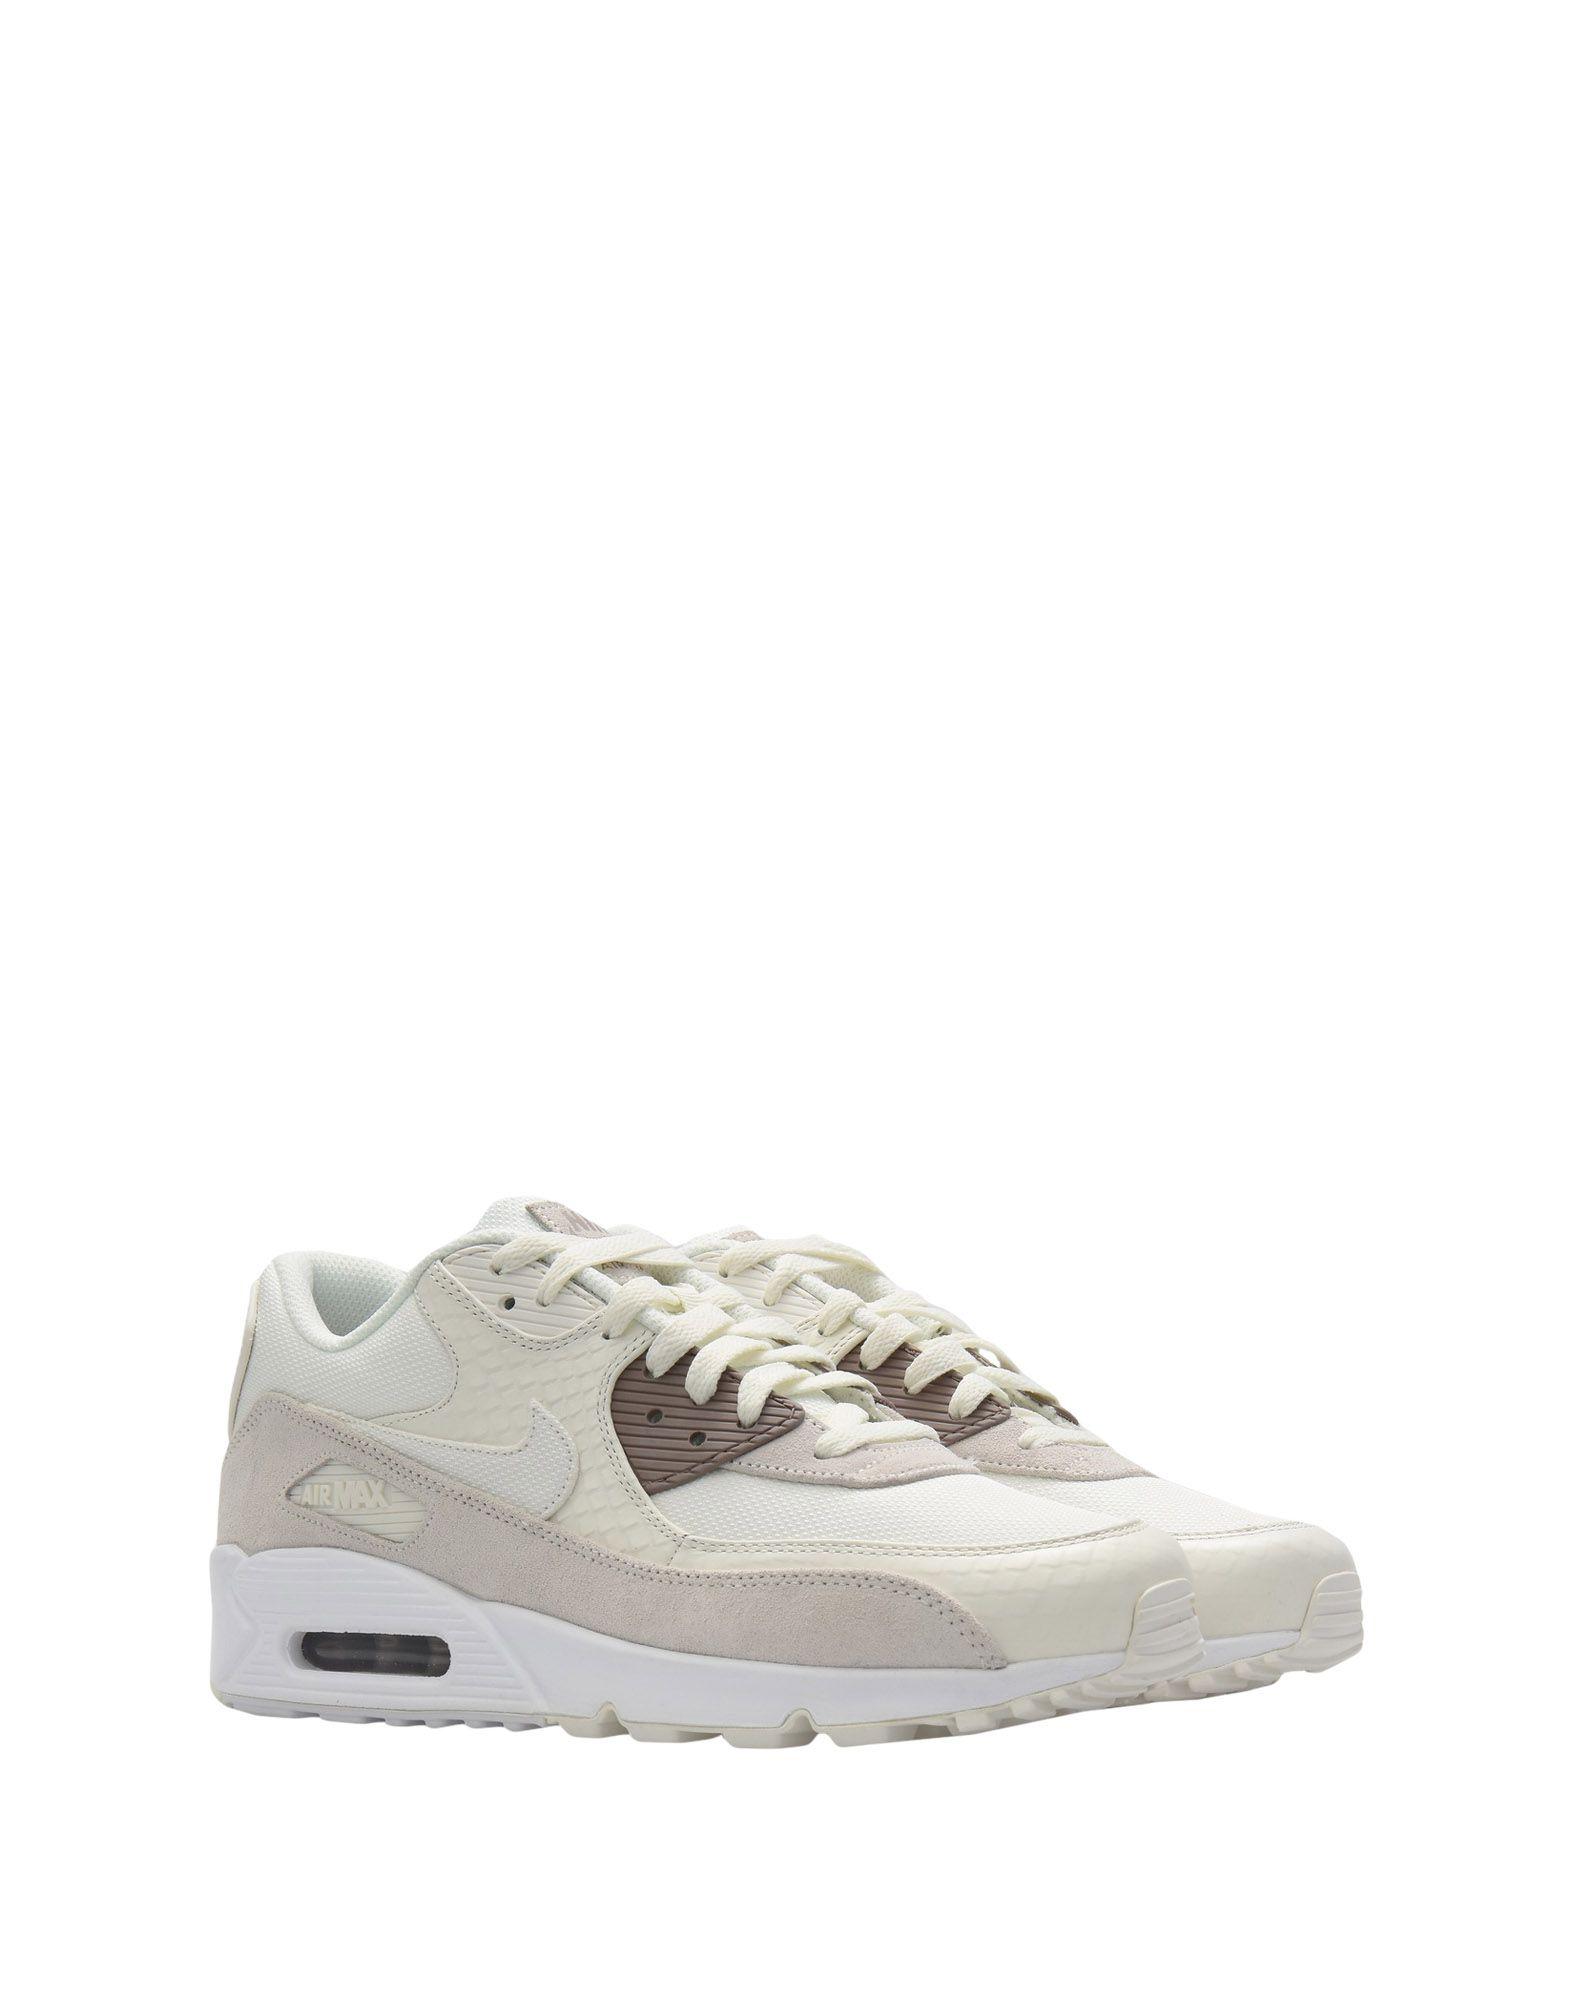 Nike Nike Air Max 90 Premium  11475113WB Heiße Schuhe